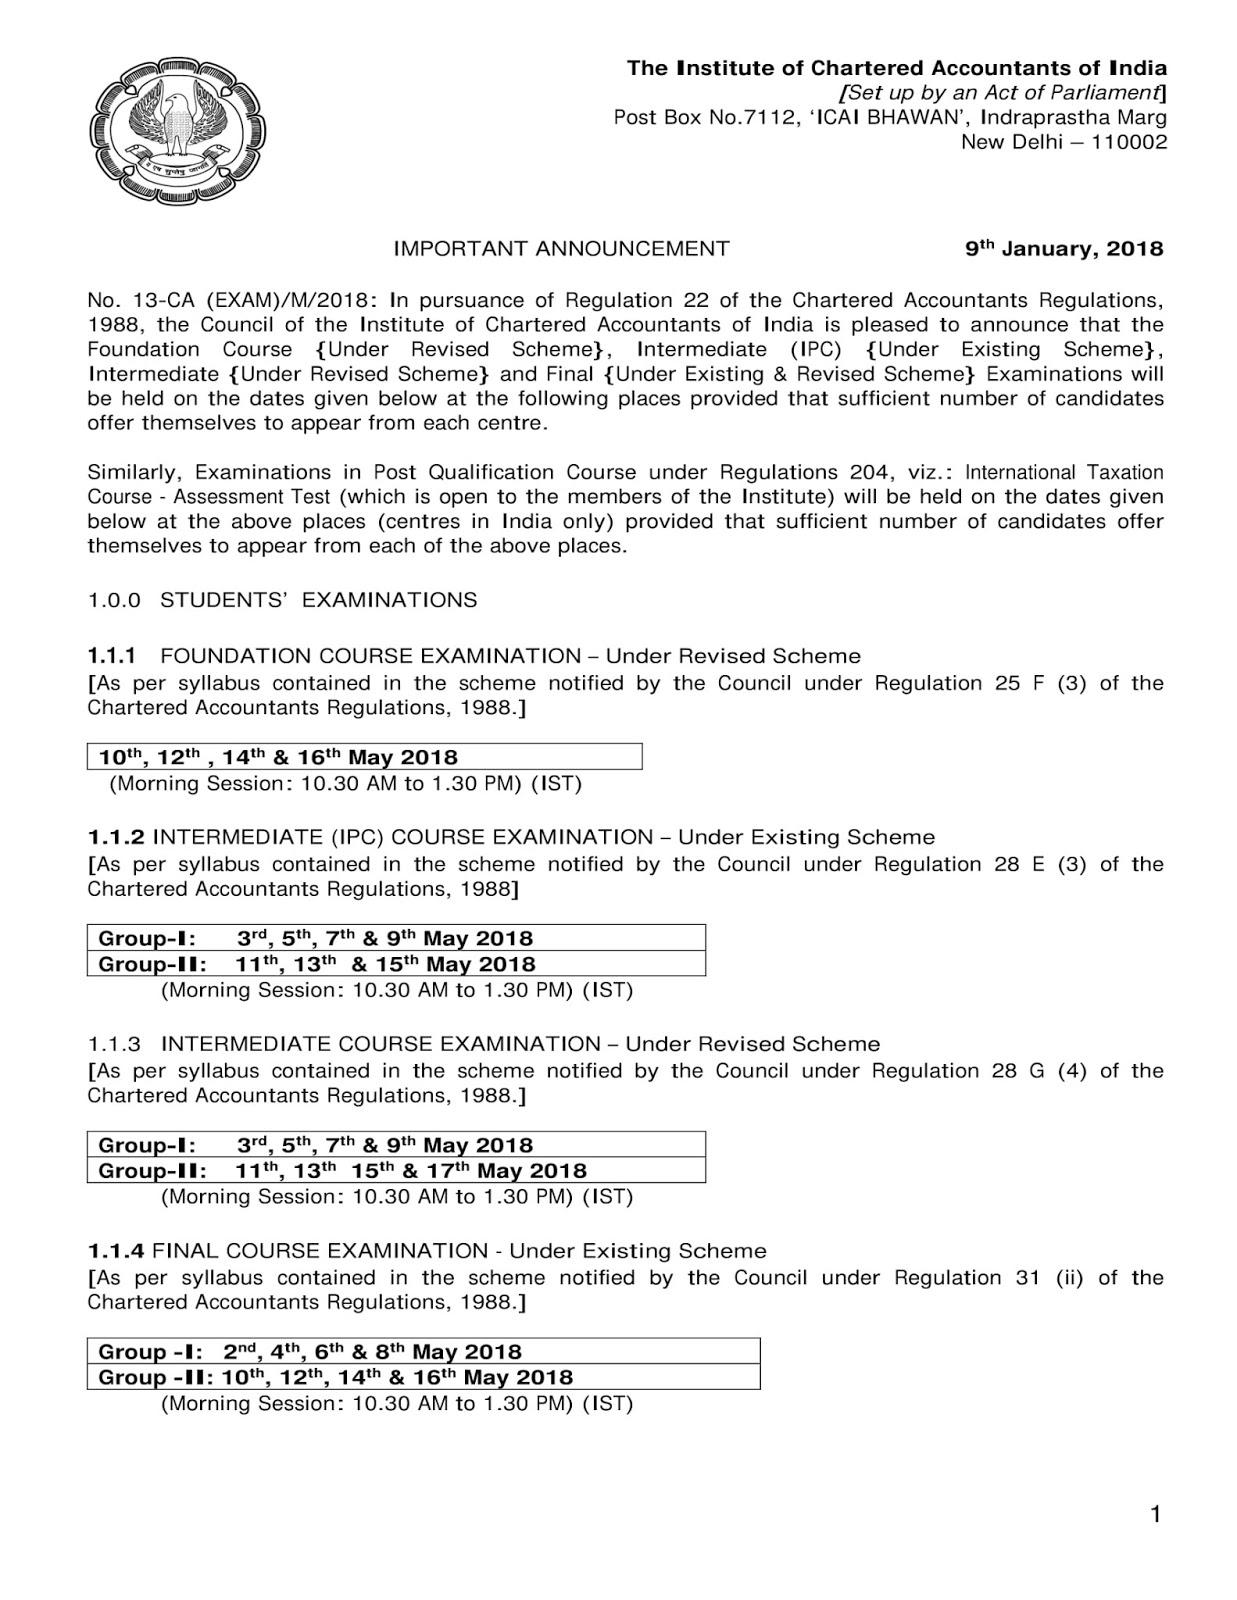 ca cpt online exam form 2018